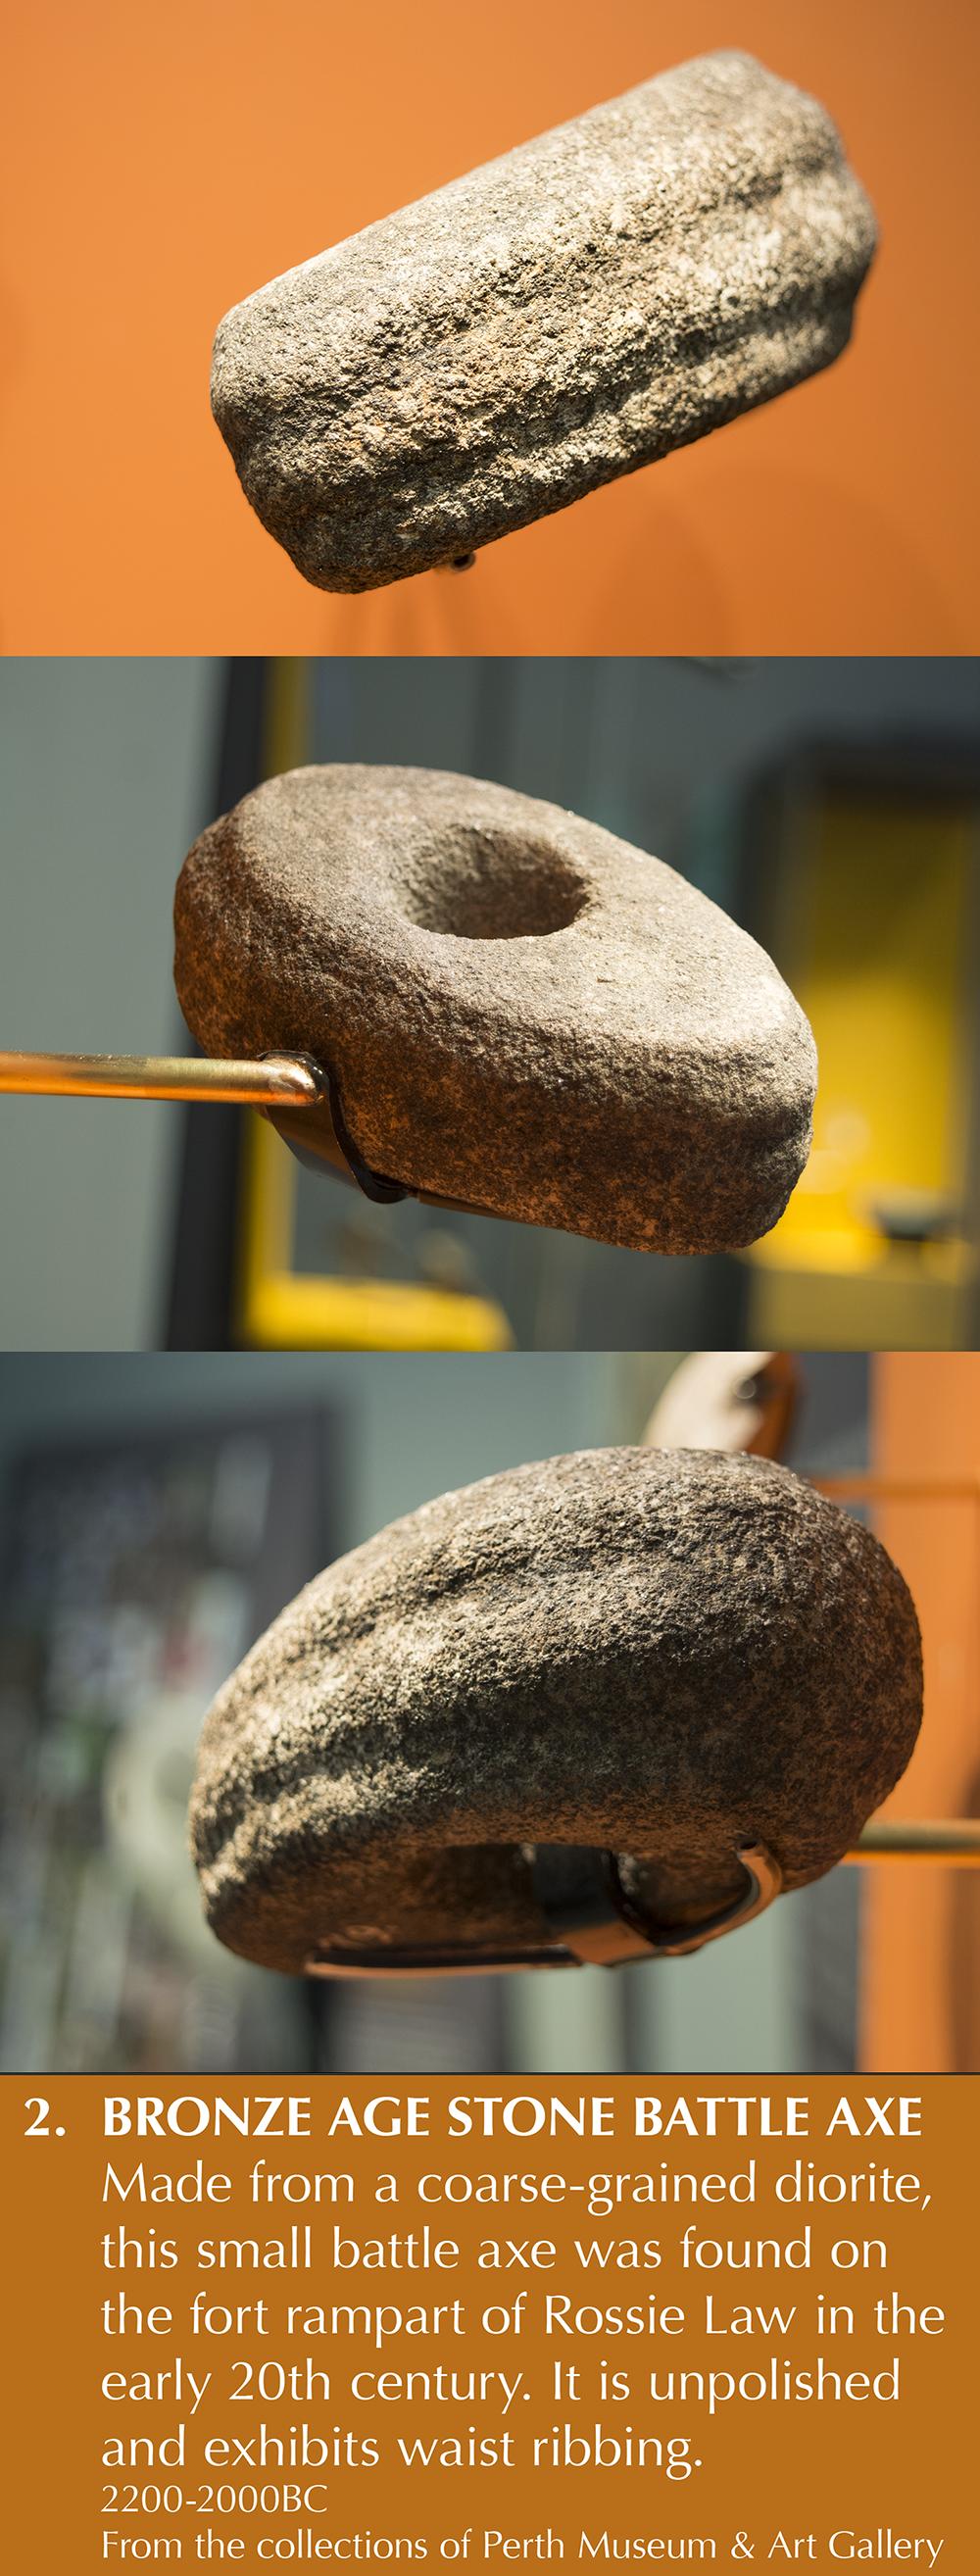 4-2-bronze-age-stone-battle-axe